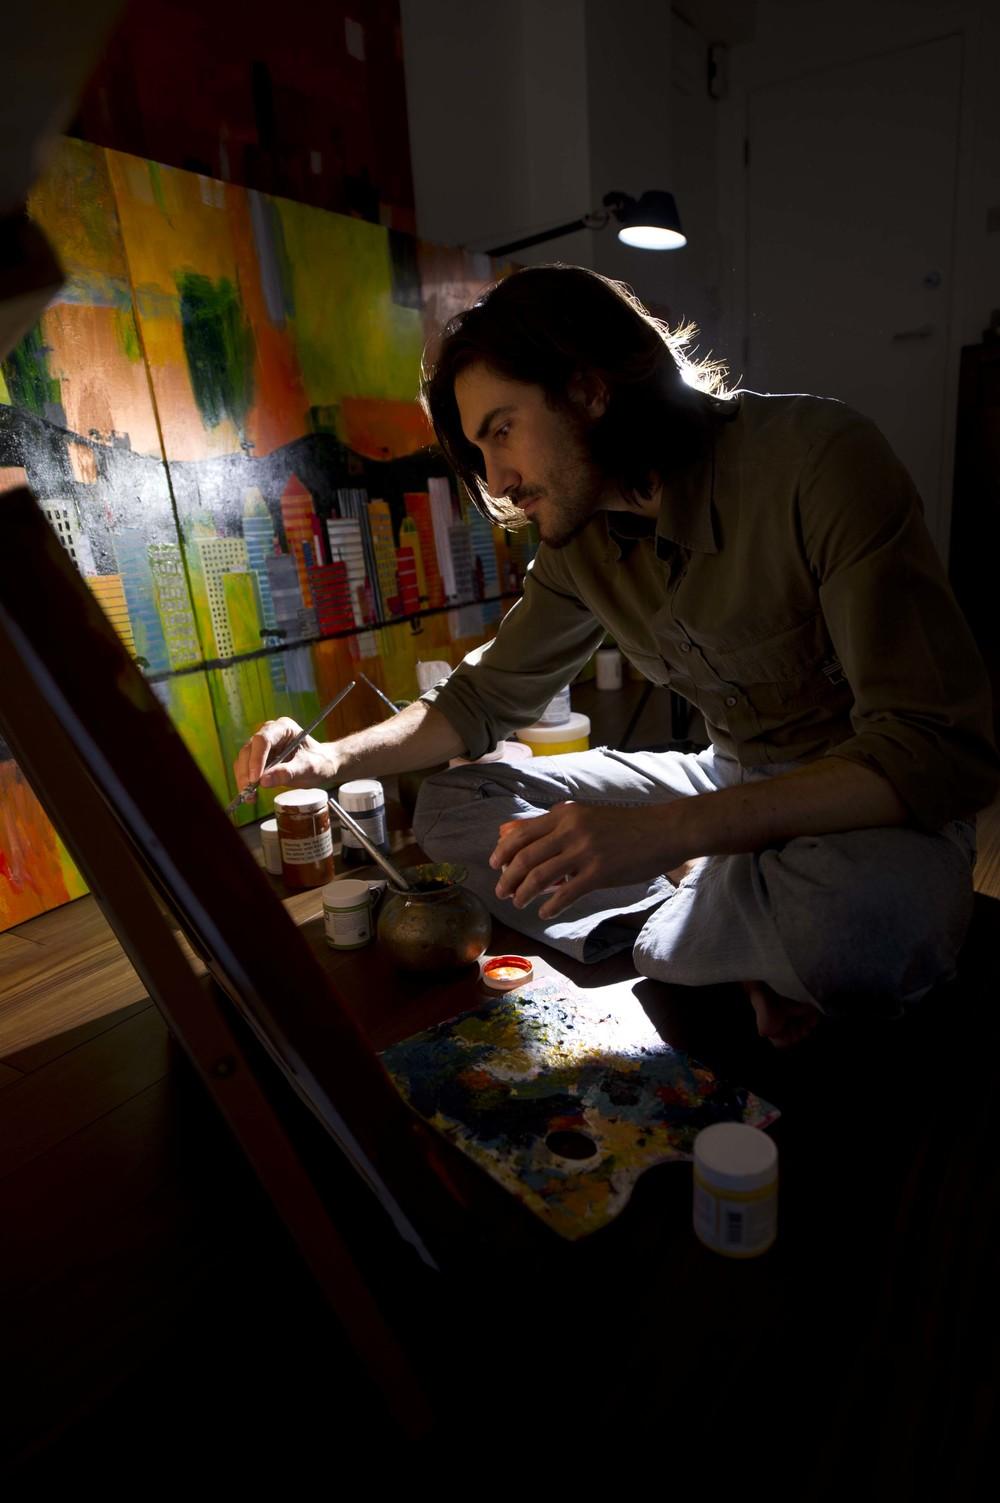 20130202 WingSze @ Painter (371).jpg